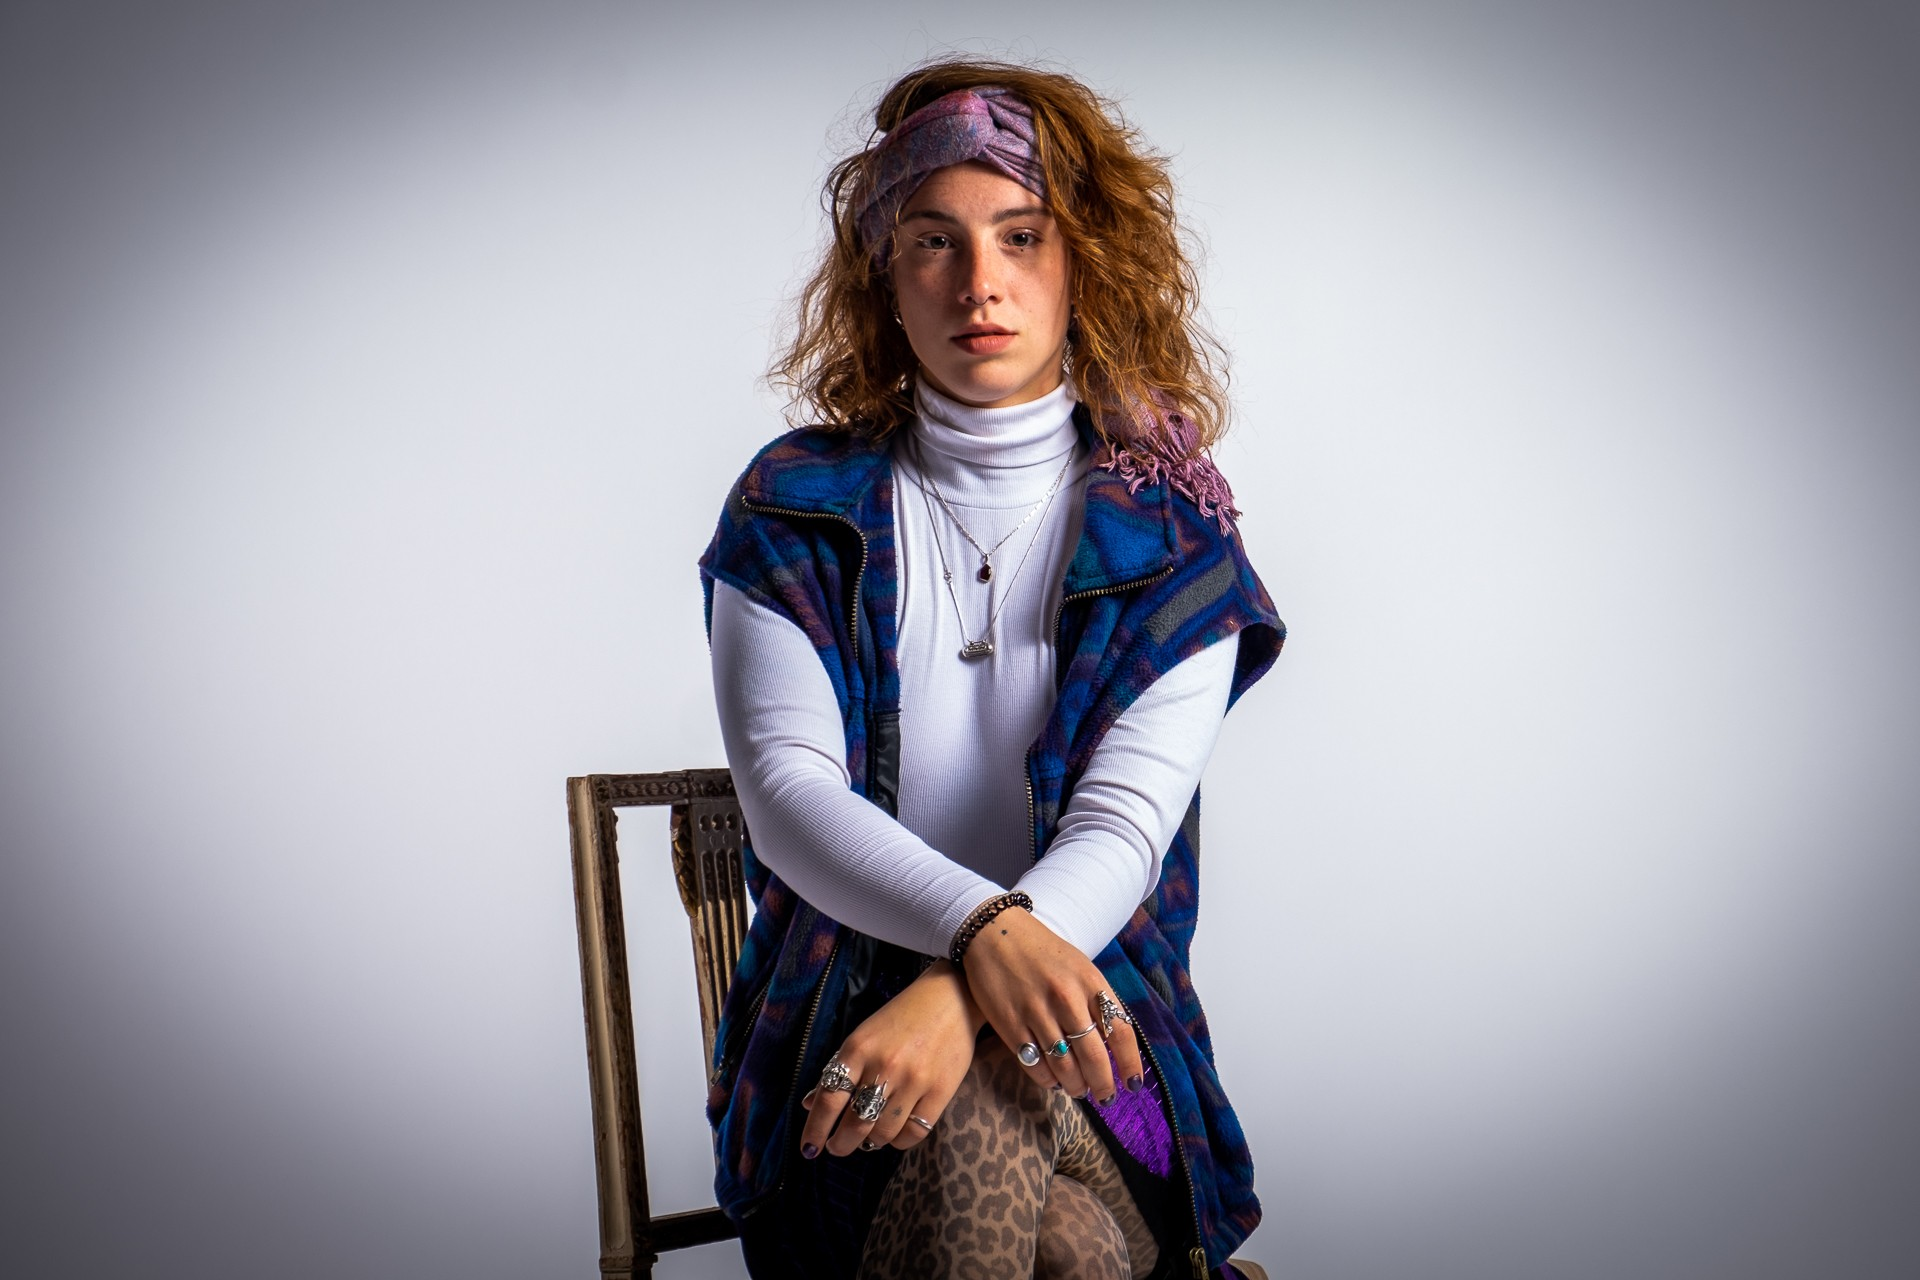 Nadia Evers (24)